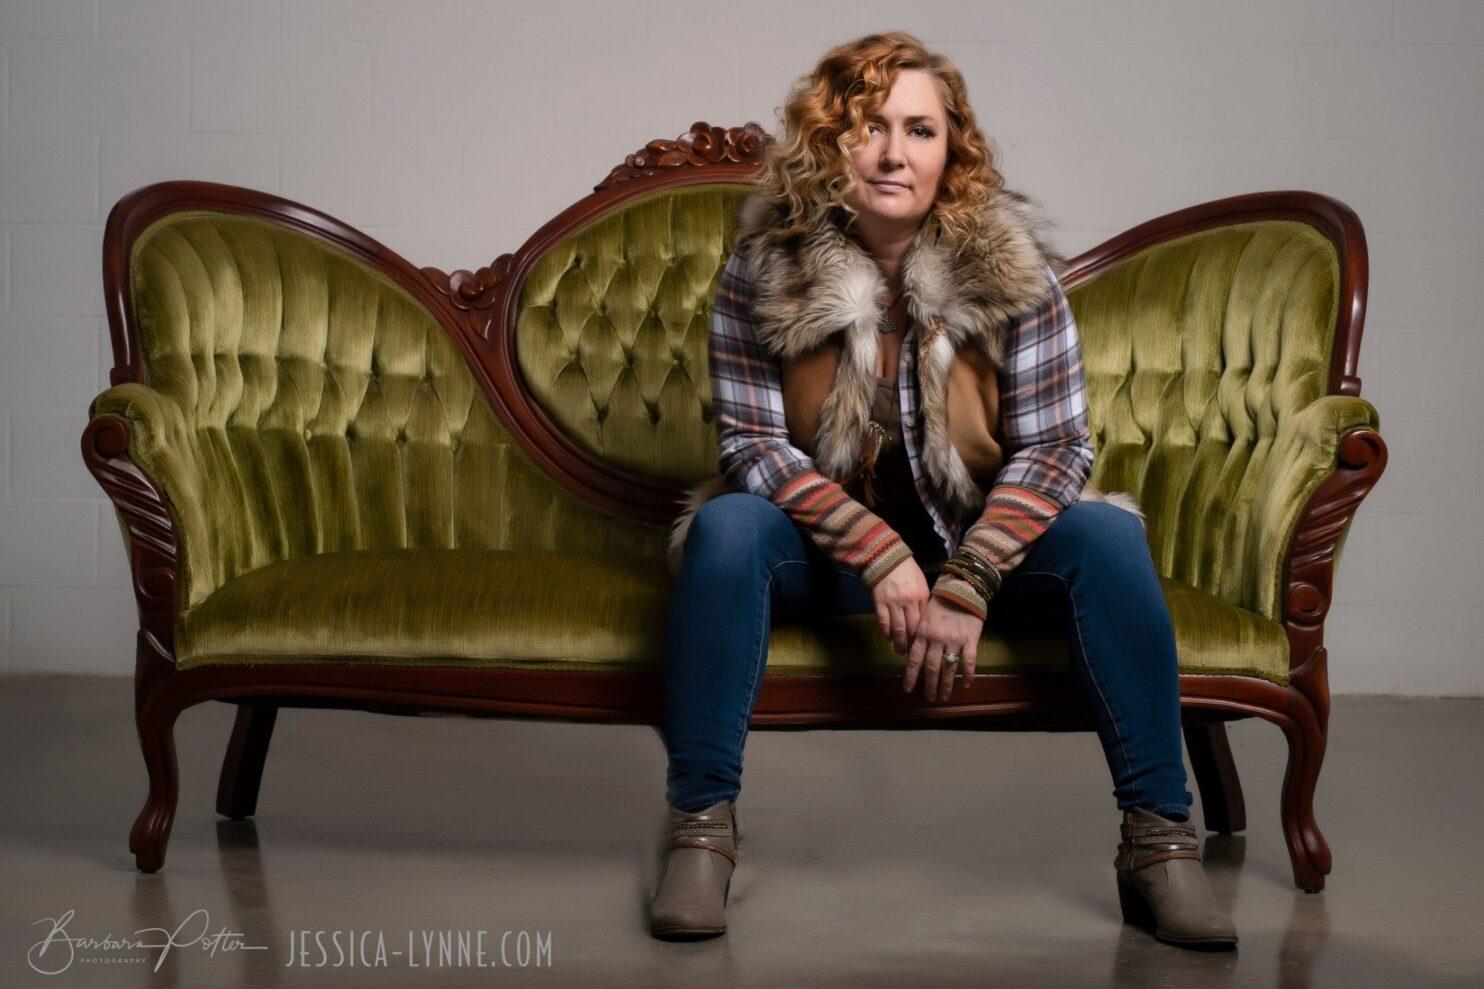 Jessica Lynne - Live Music